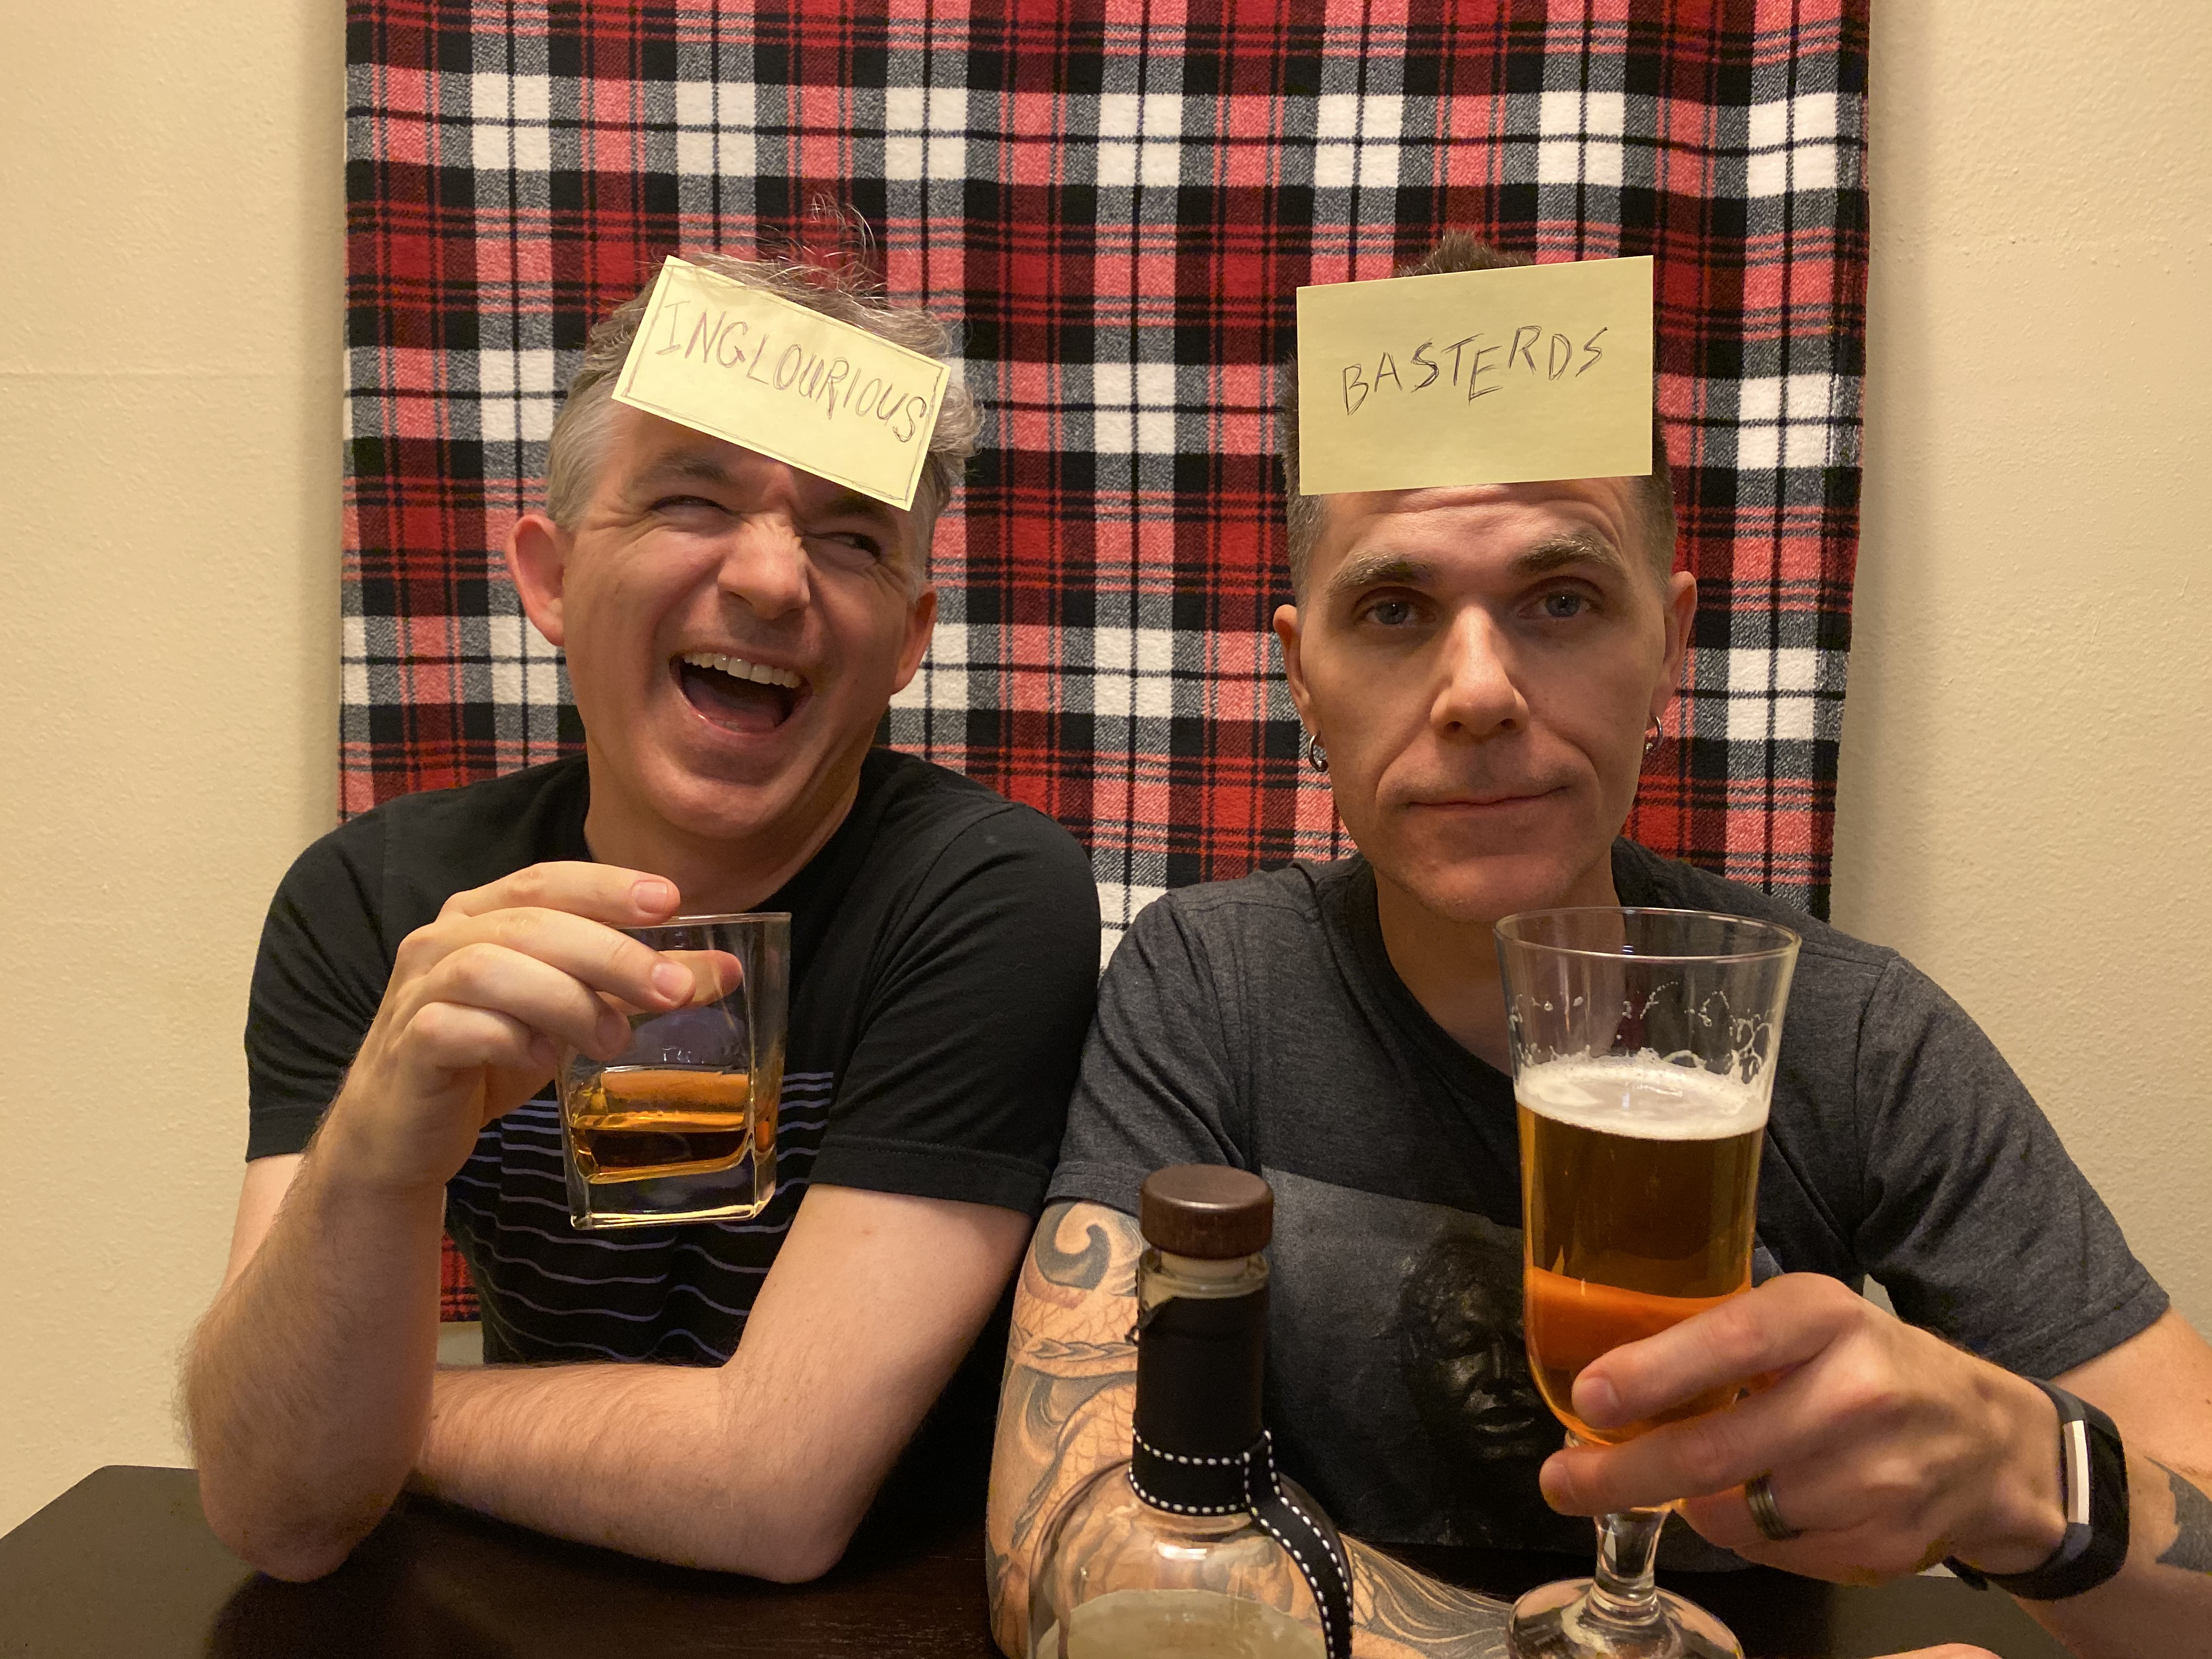 Jeff & Dan Basterds